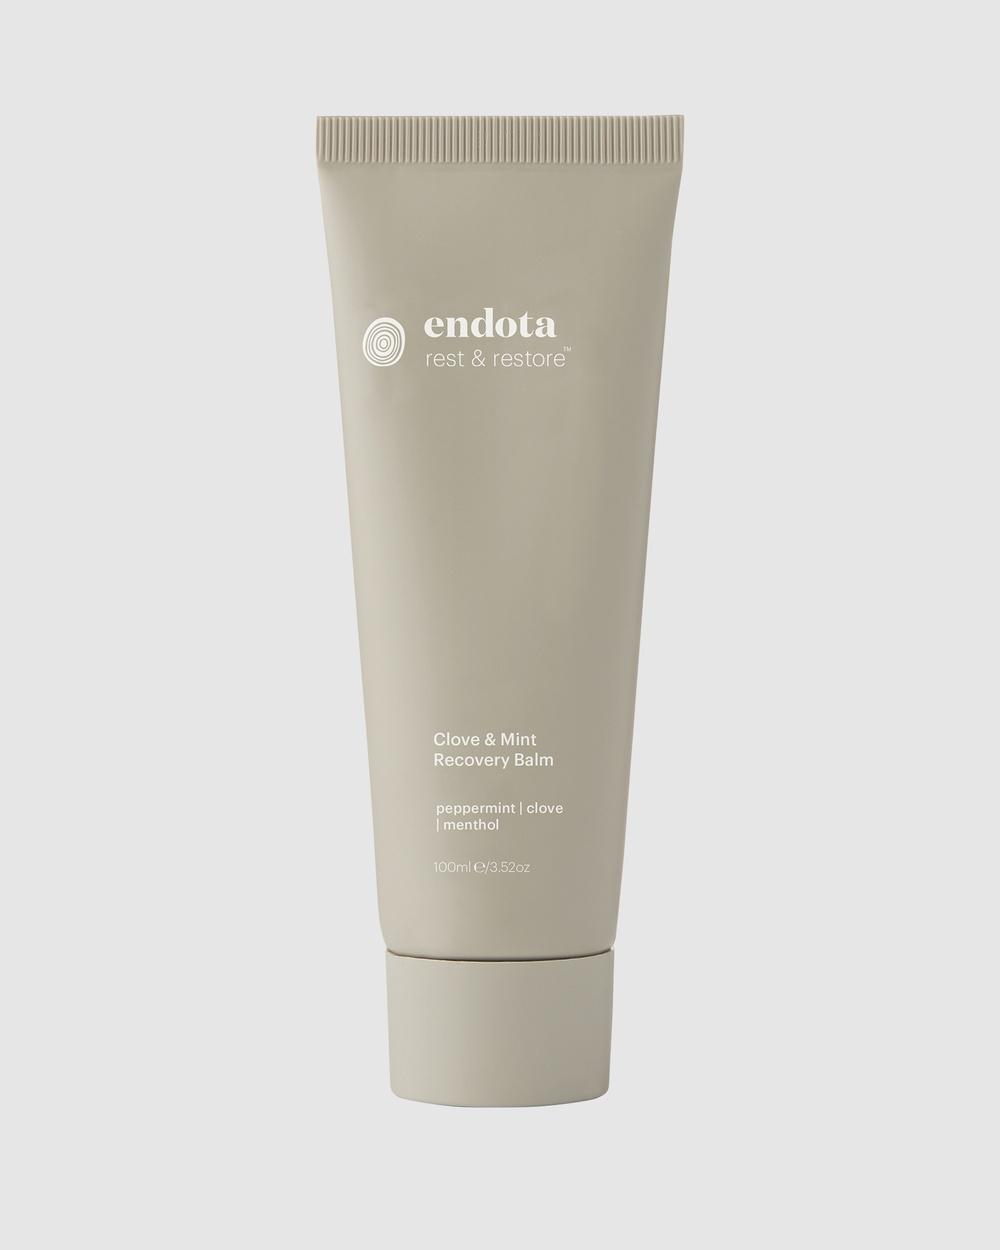 Endota Rest & Restore Clove Mint Recovery Balm Massage